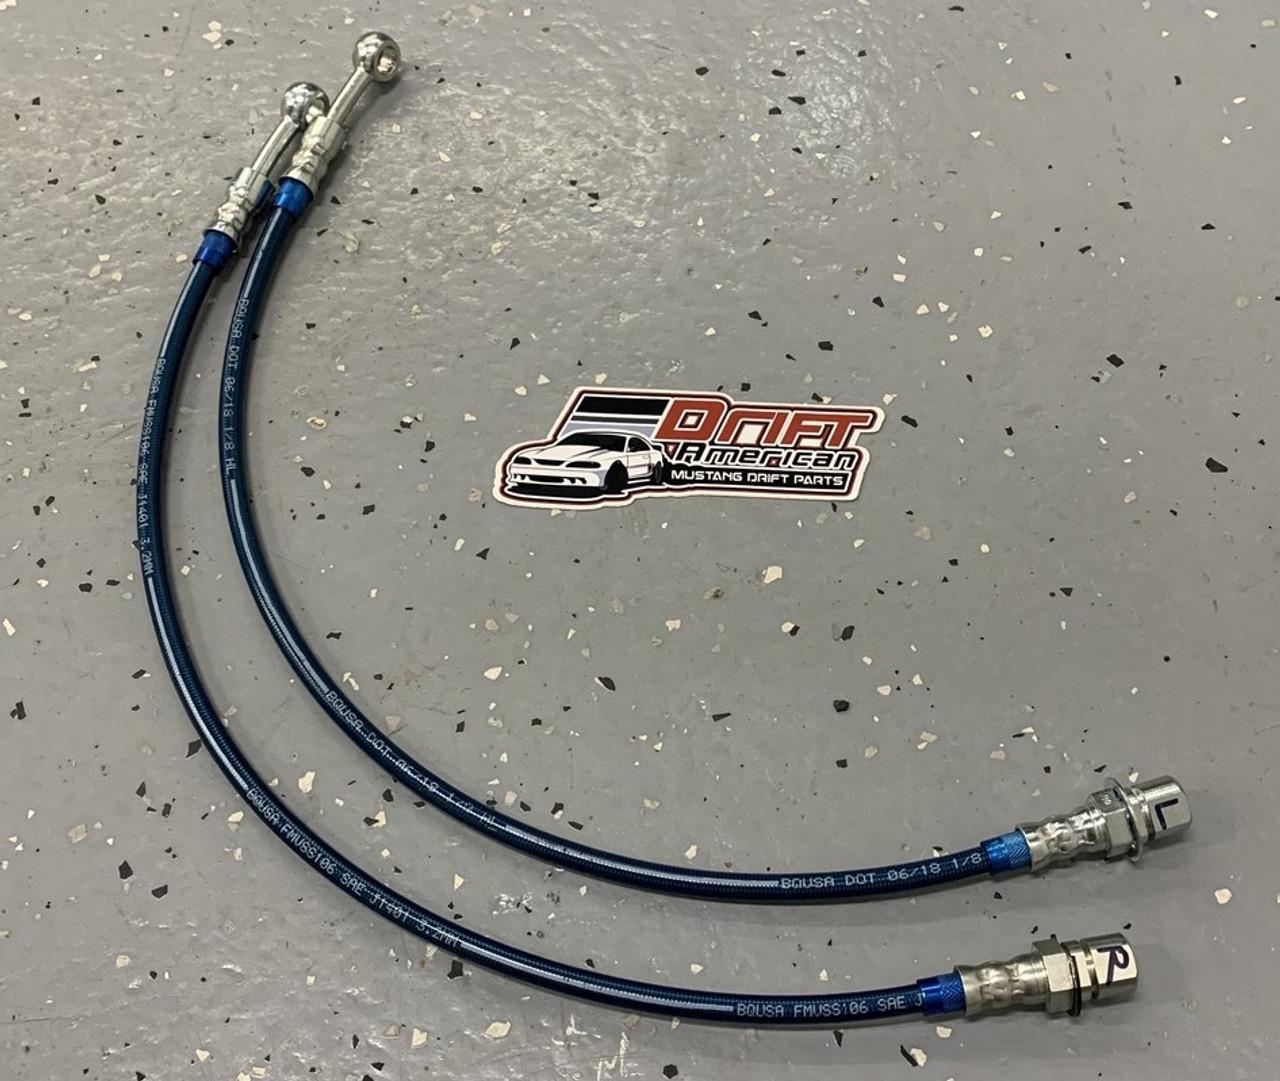 Drift American Extended Length Steel Braided Brake Lines for 79-04 Mustang shown in Blue